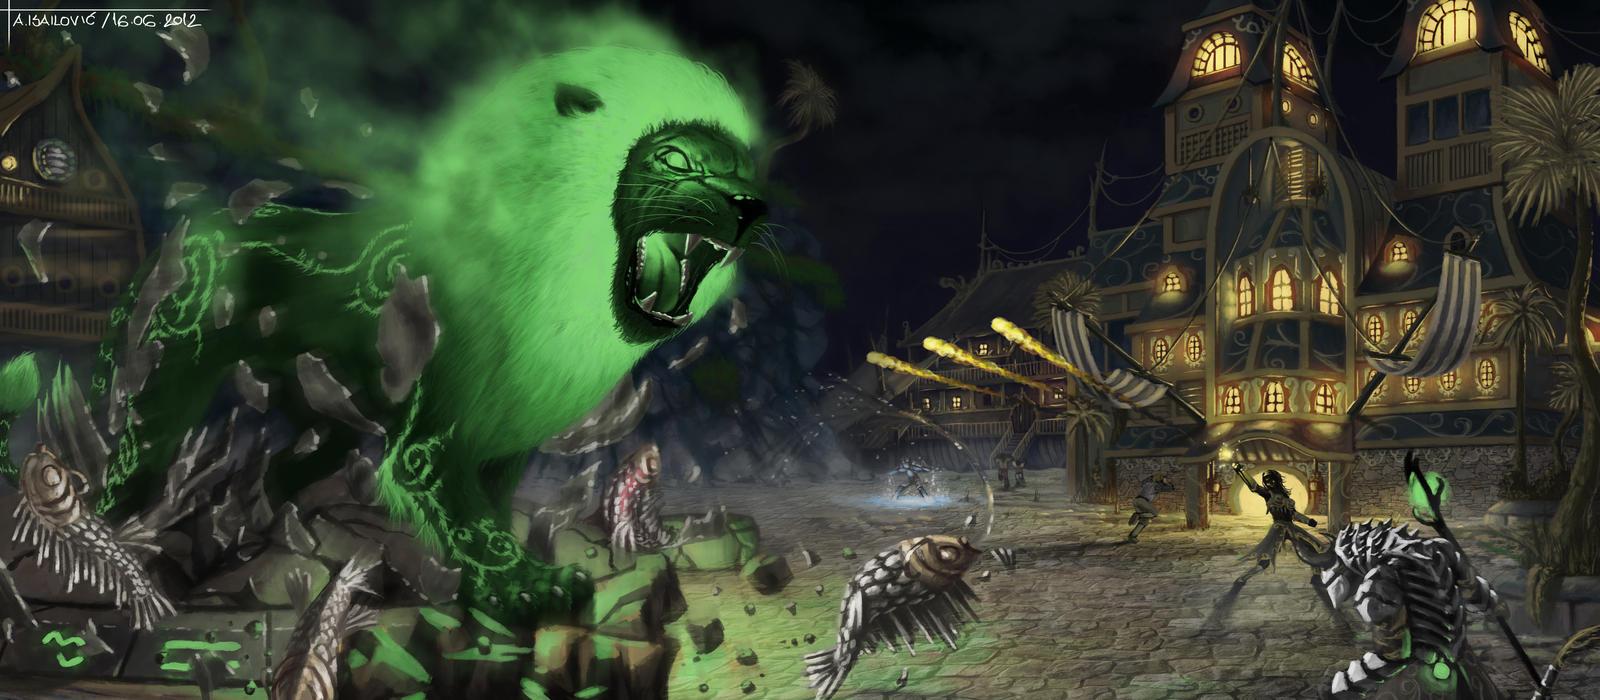 Welcome to Lion's Arch - Guild Wars 2 Fan Art by SkavenZverov on ...